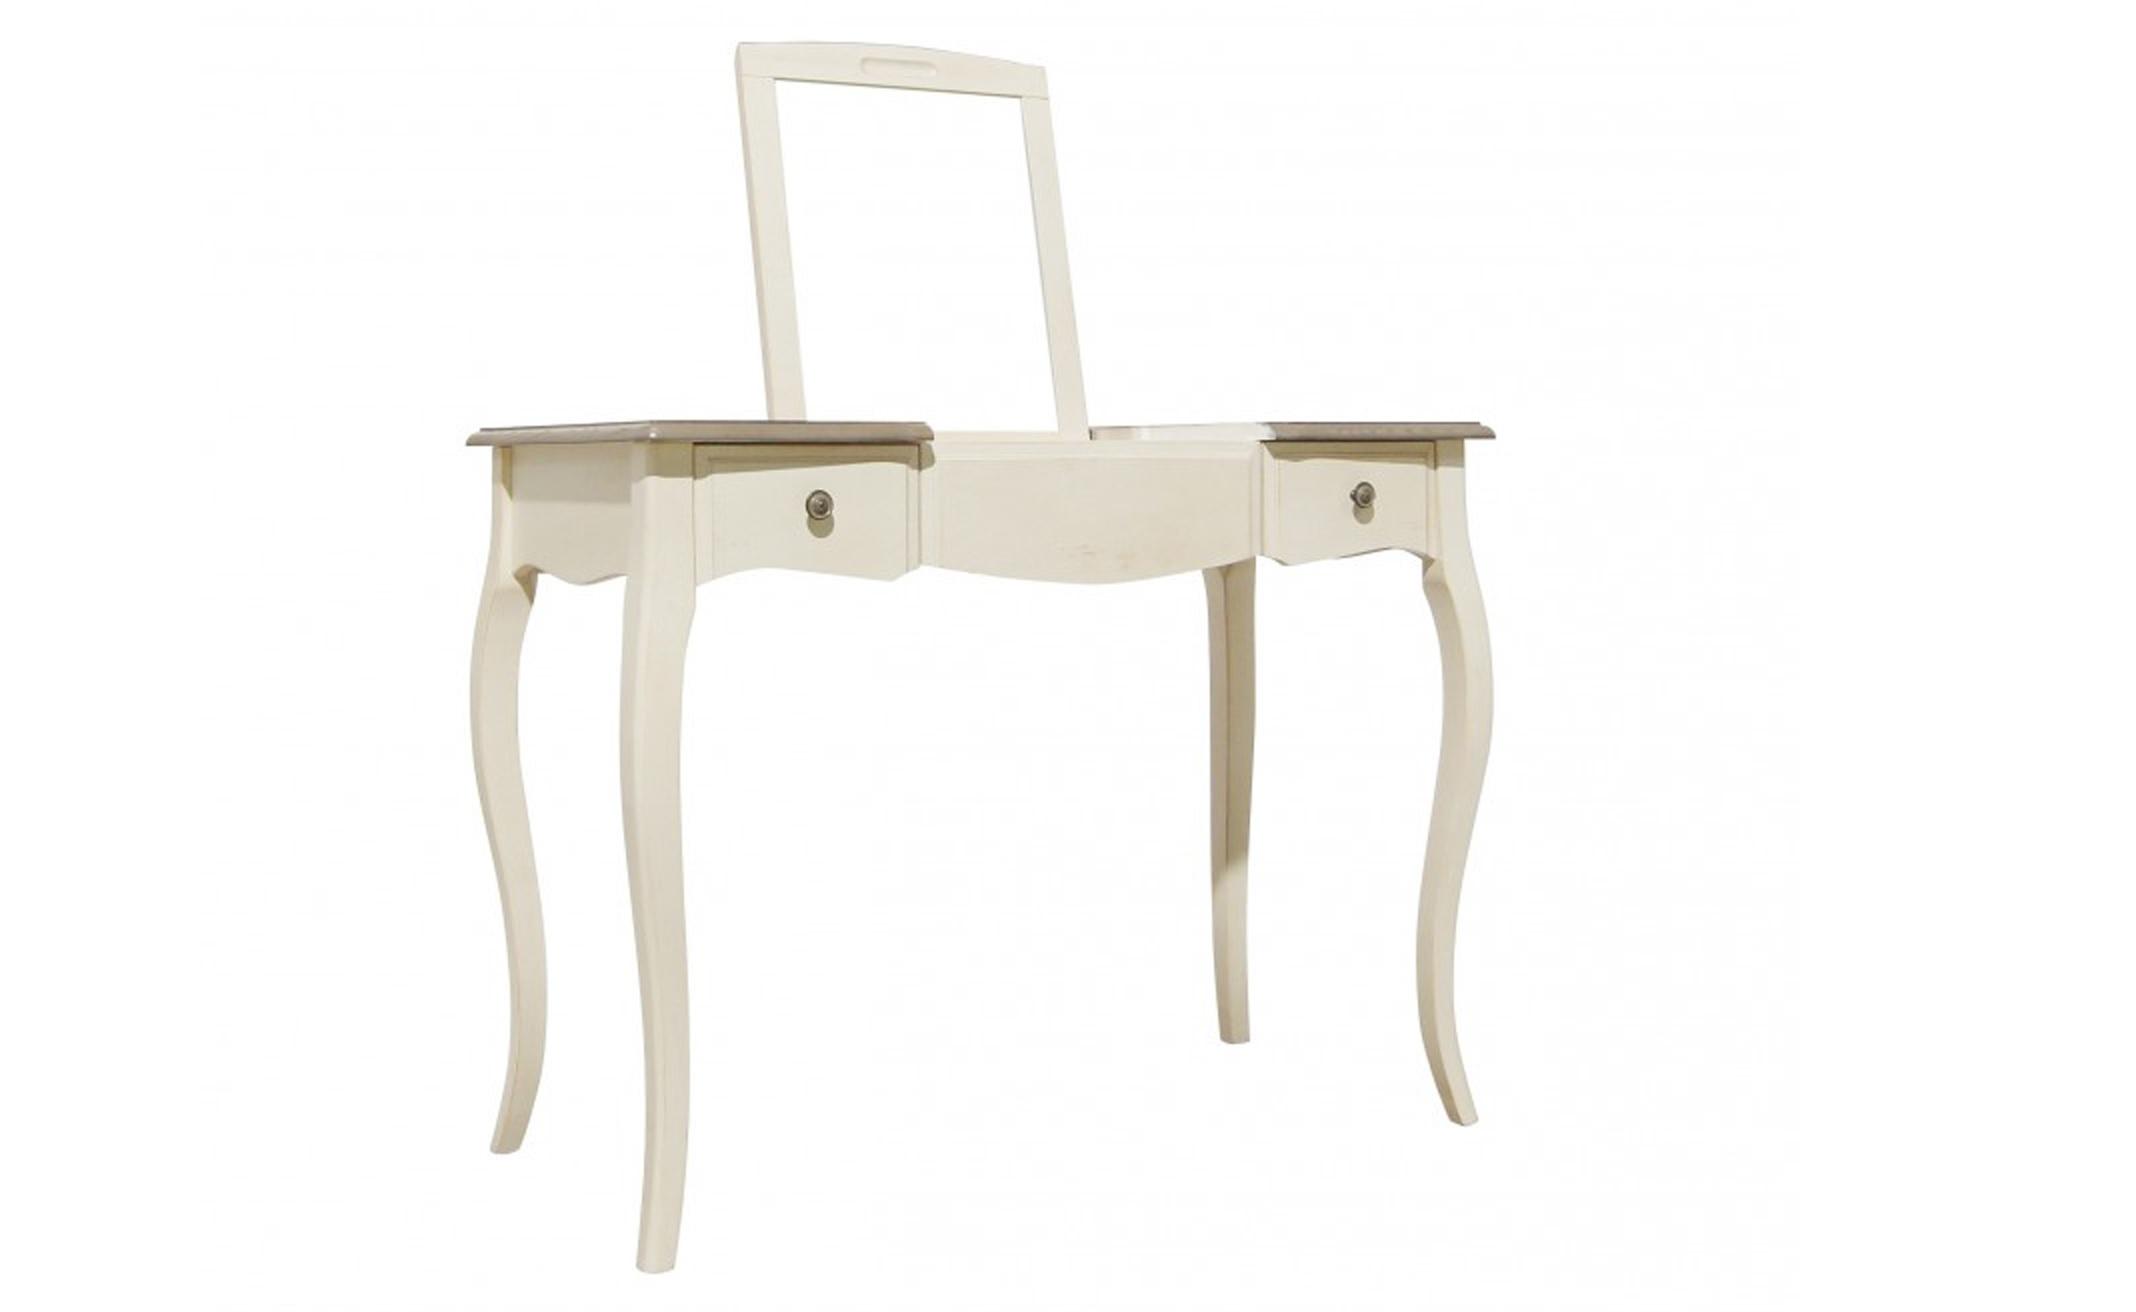 Стол туалетный с зеркаломТуалетные столики<br><br><br>Material: Бук<br>Width см: 100<br>Depth см: 49<br>Height см: 77